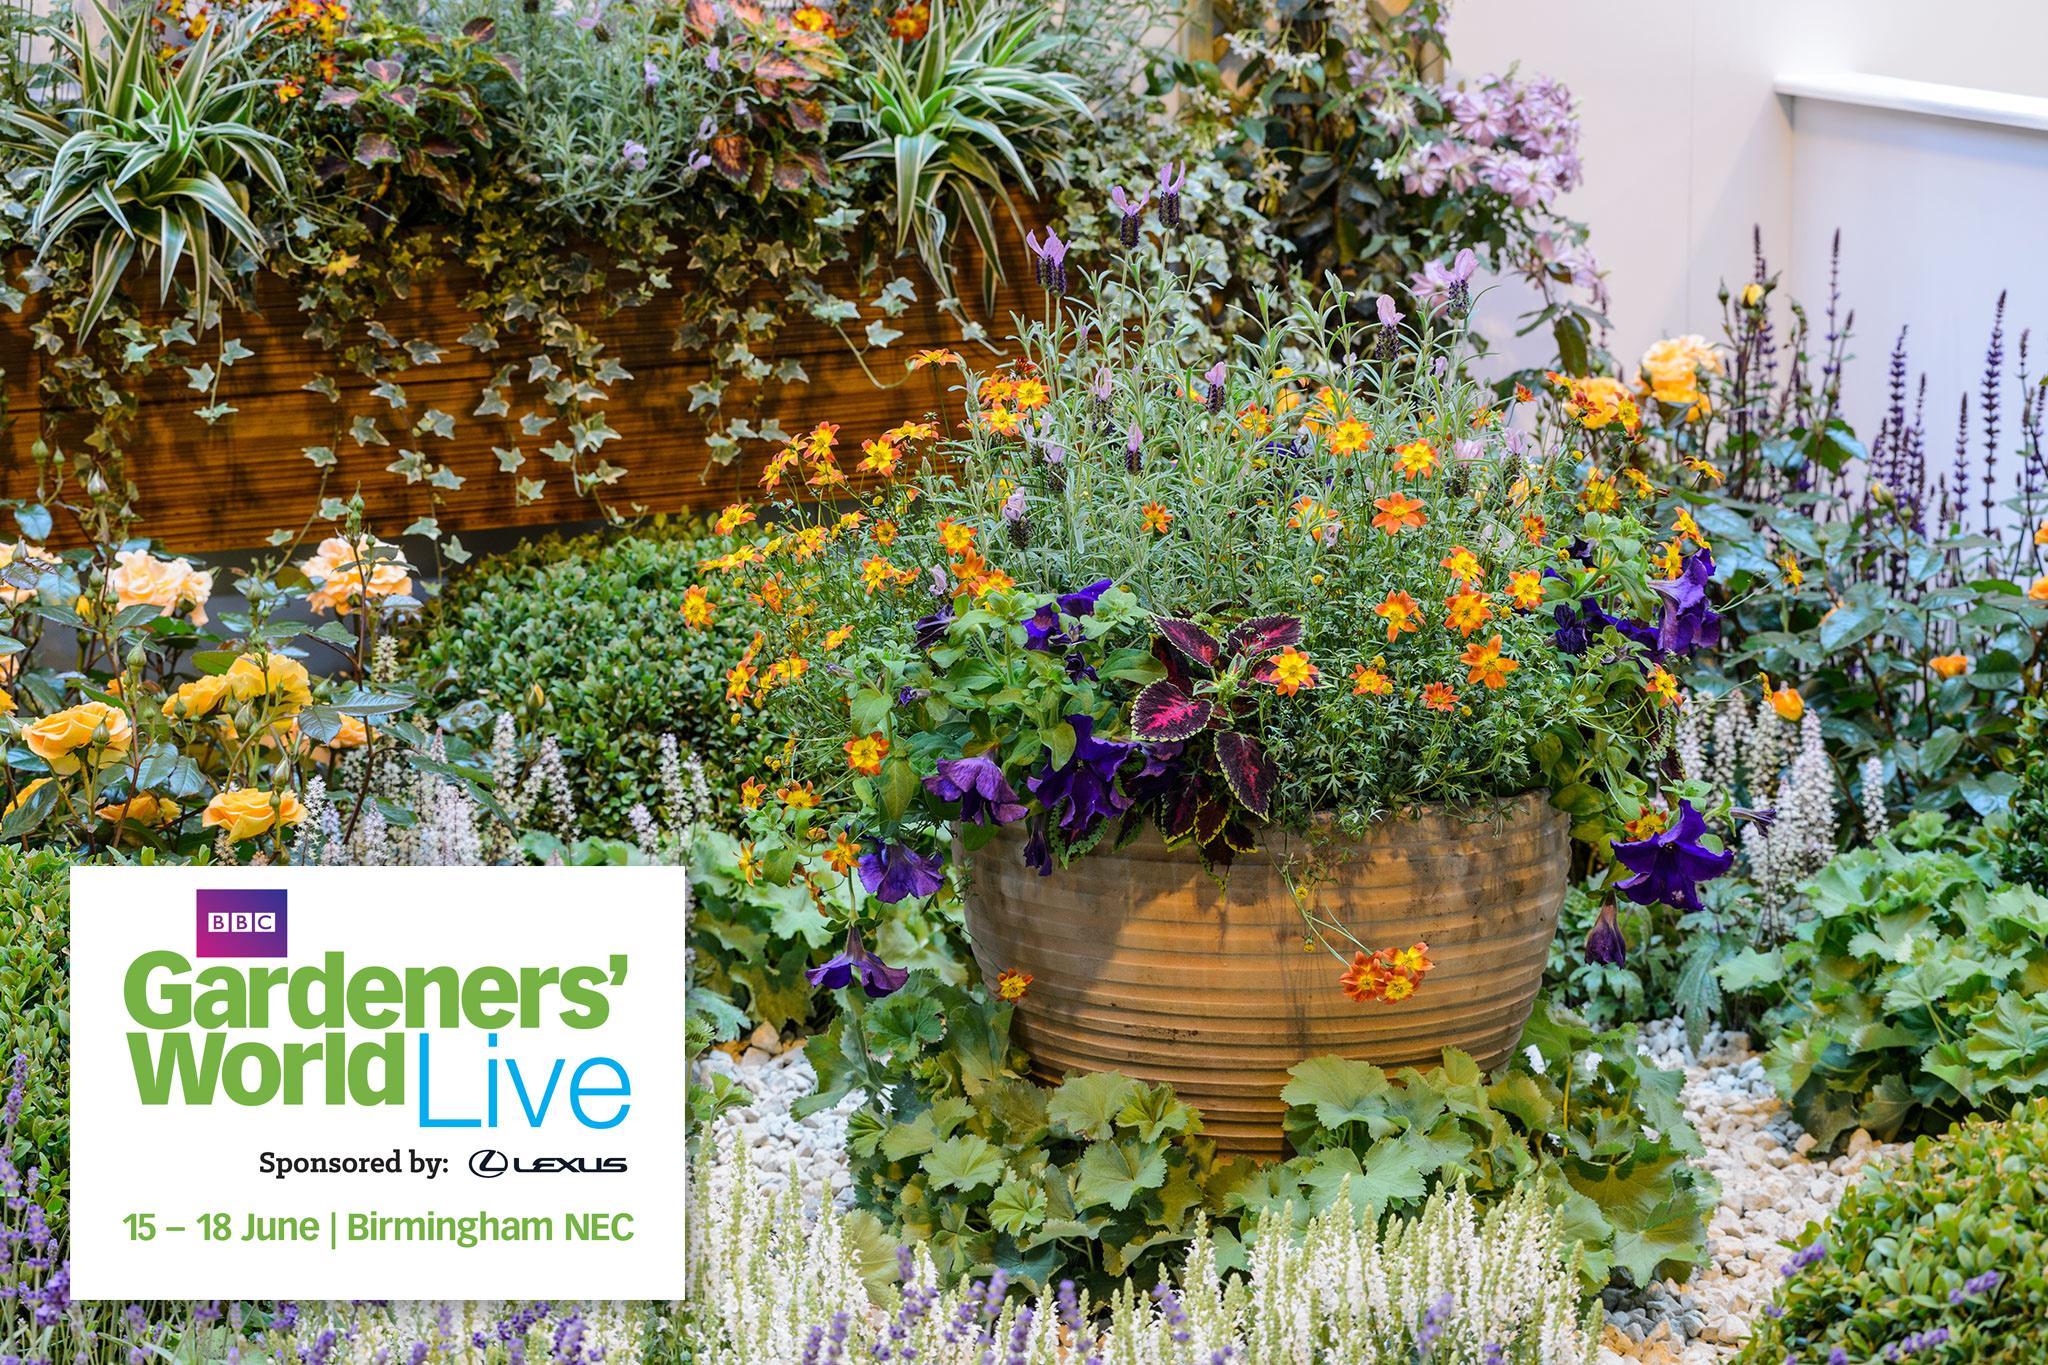 BBC Gardeners' World Live 2017